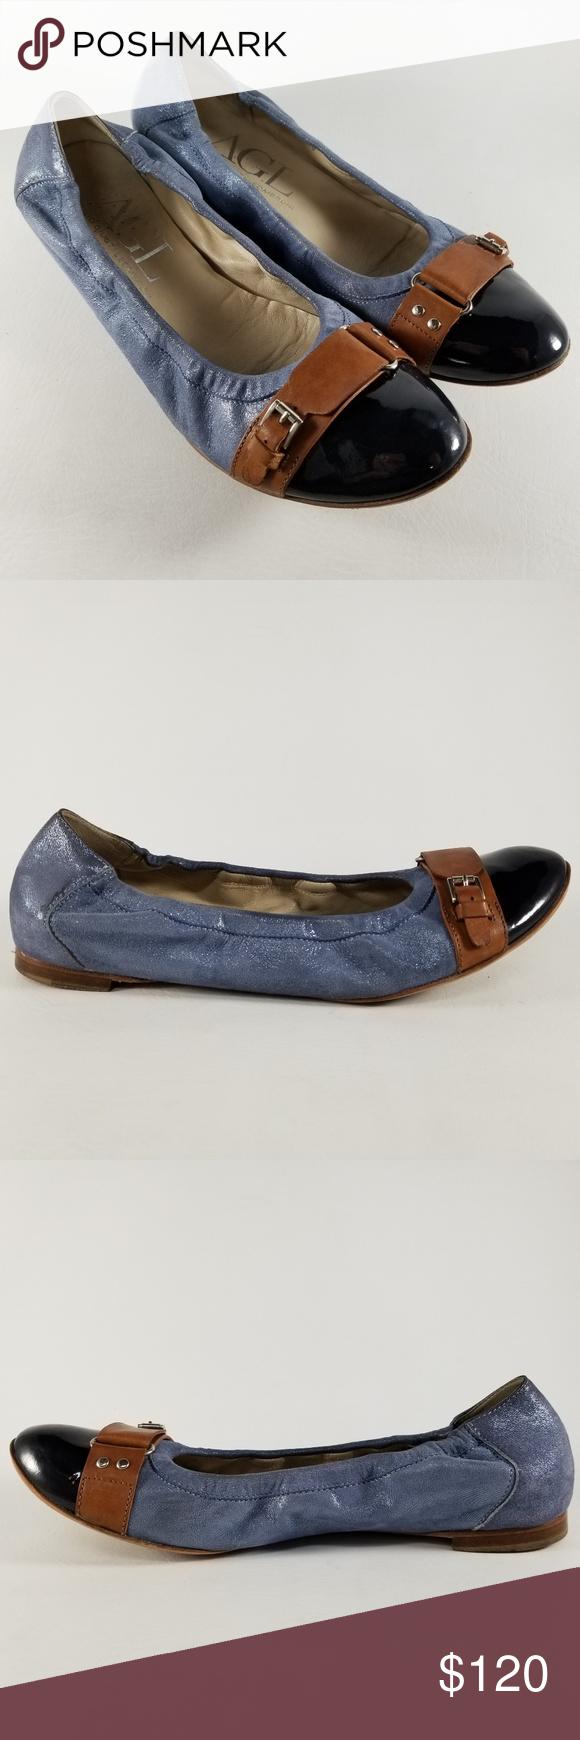 Attilio Giusti Leombruni Shoes   Agl Ballet Flats 38 2